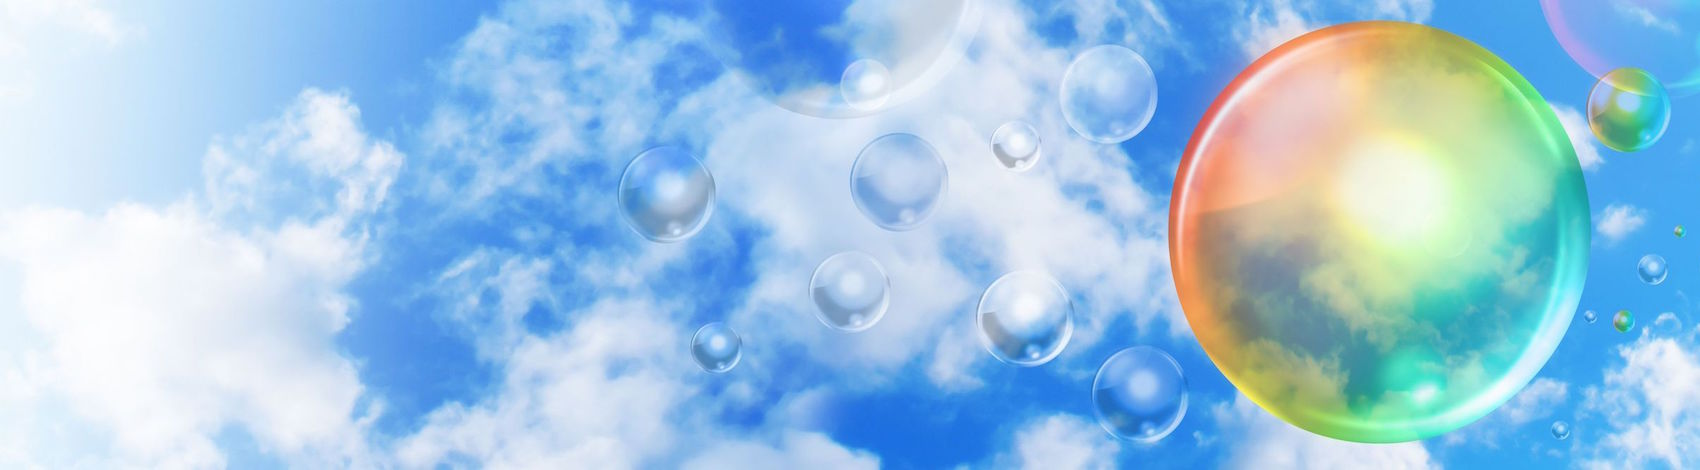 Bubbles Idea cropped